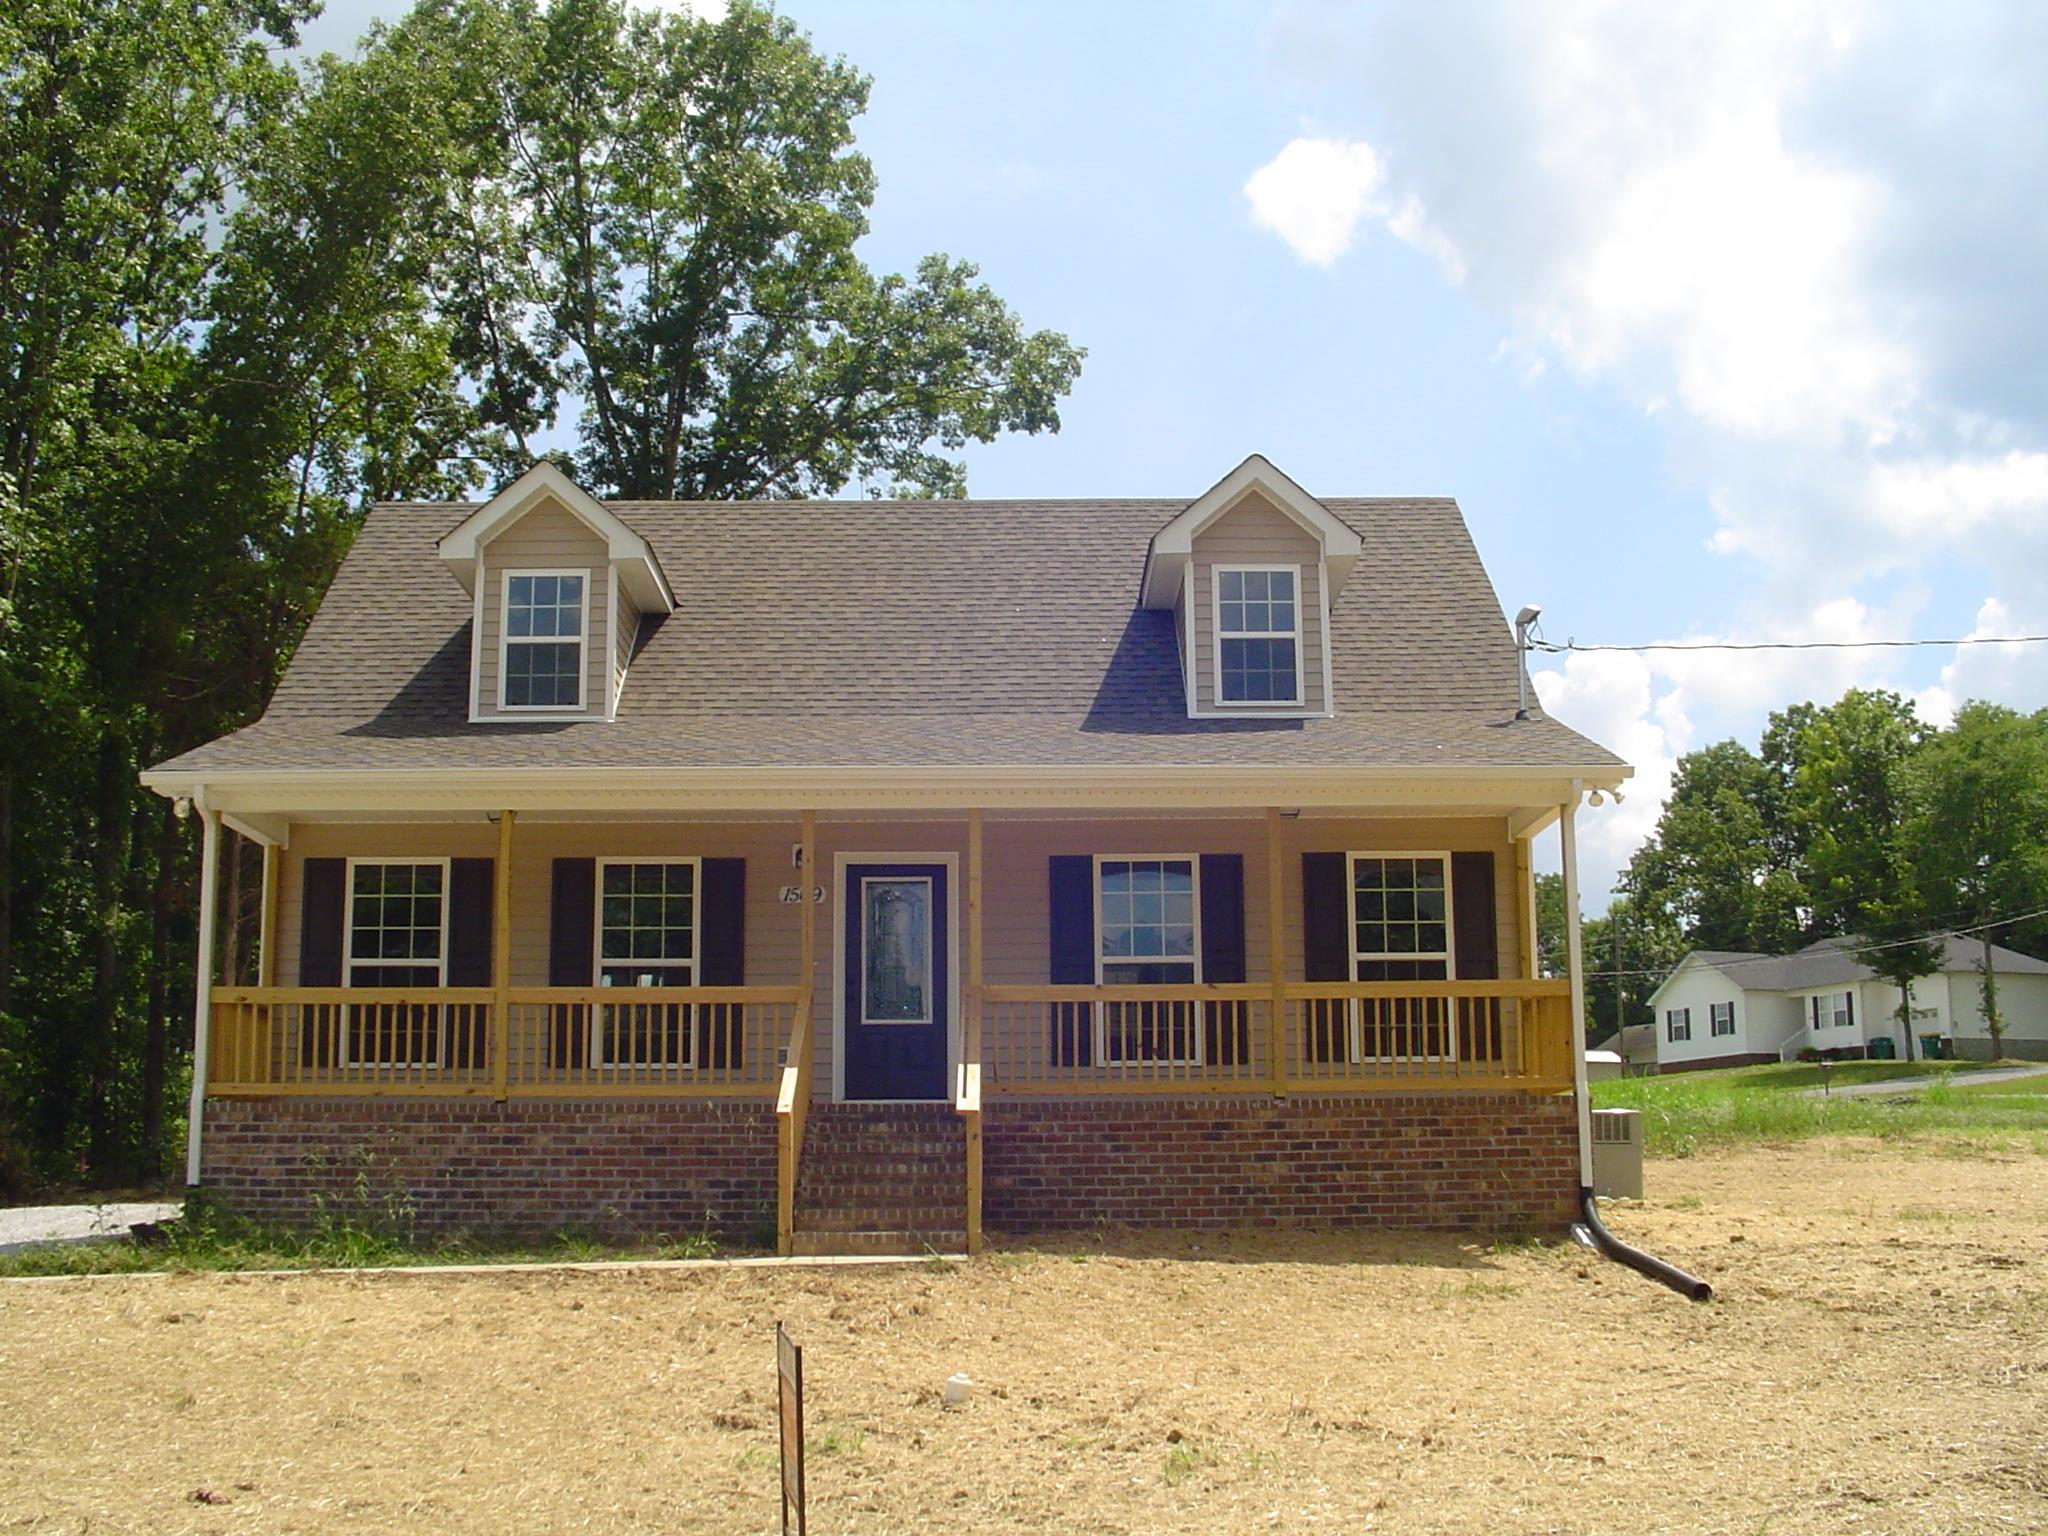 1509 Joanne Cir, Lewisburg, TN 37091